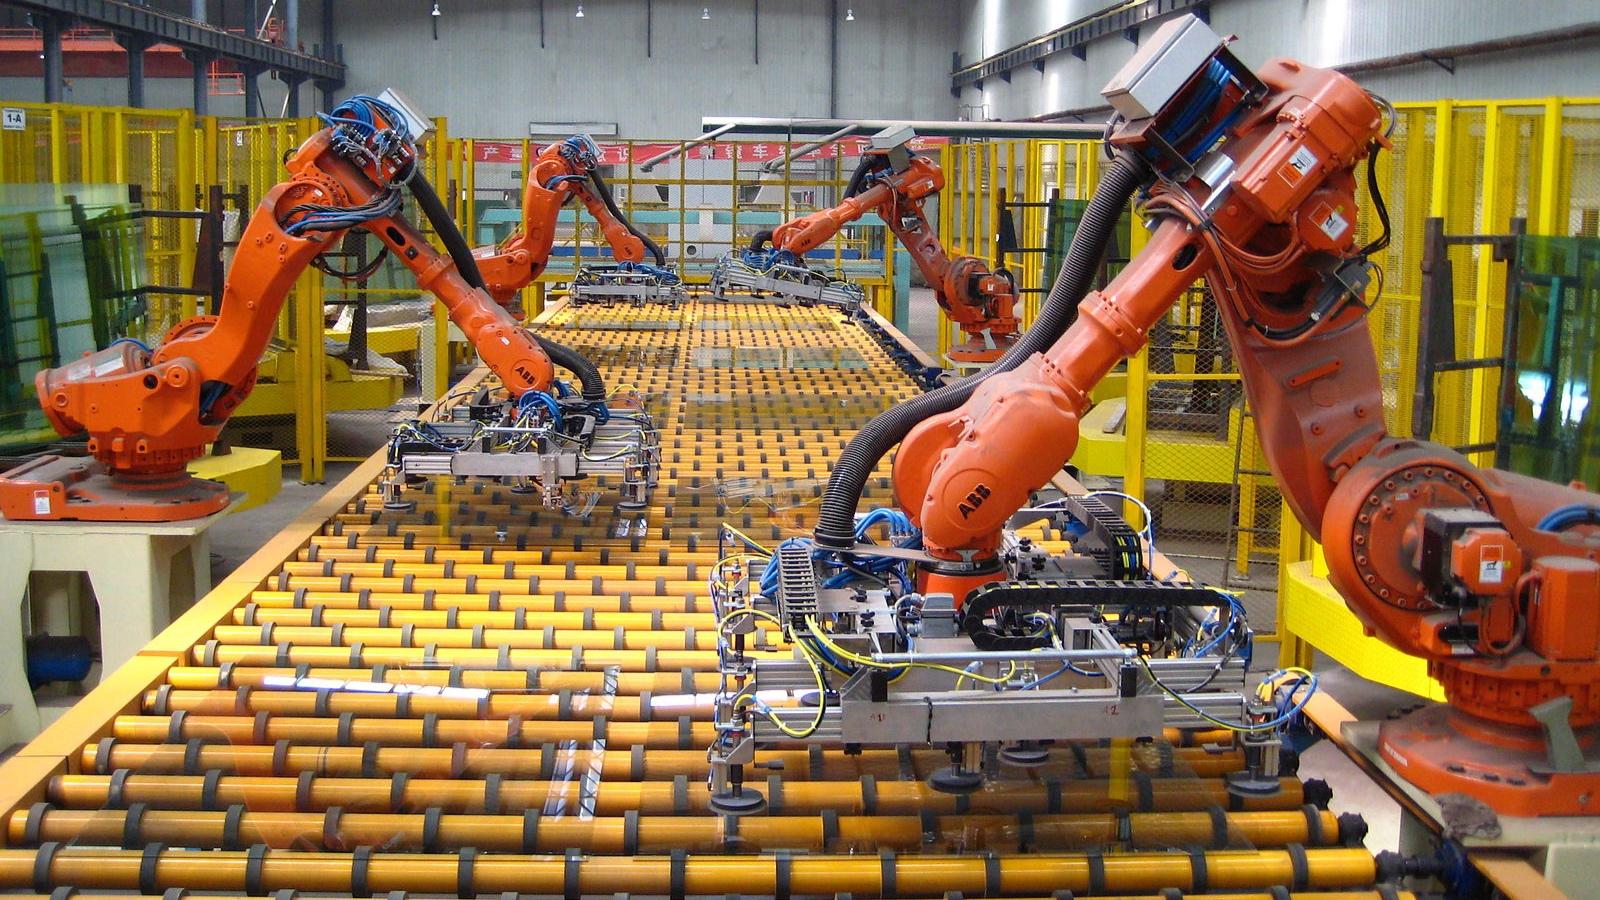 Intelligent Robotics - CAGR of $20 Billion by 2023